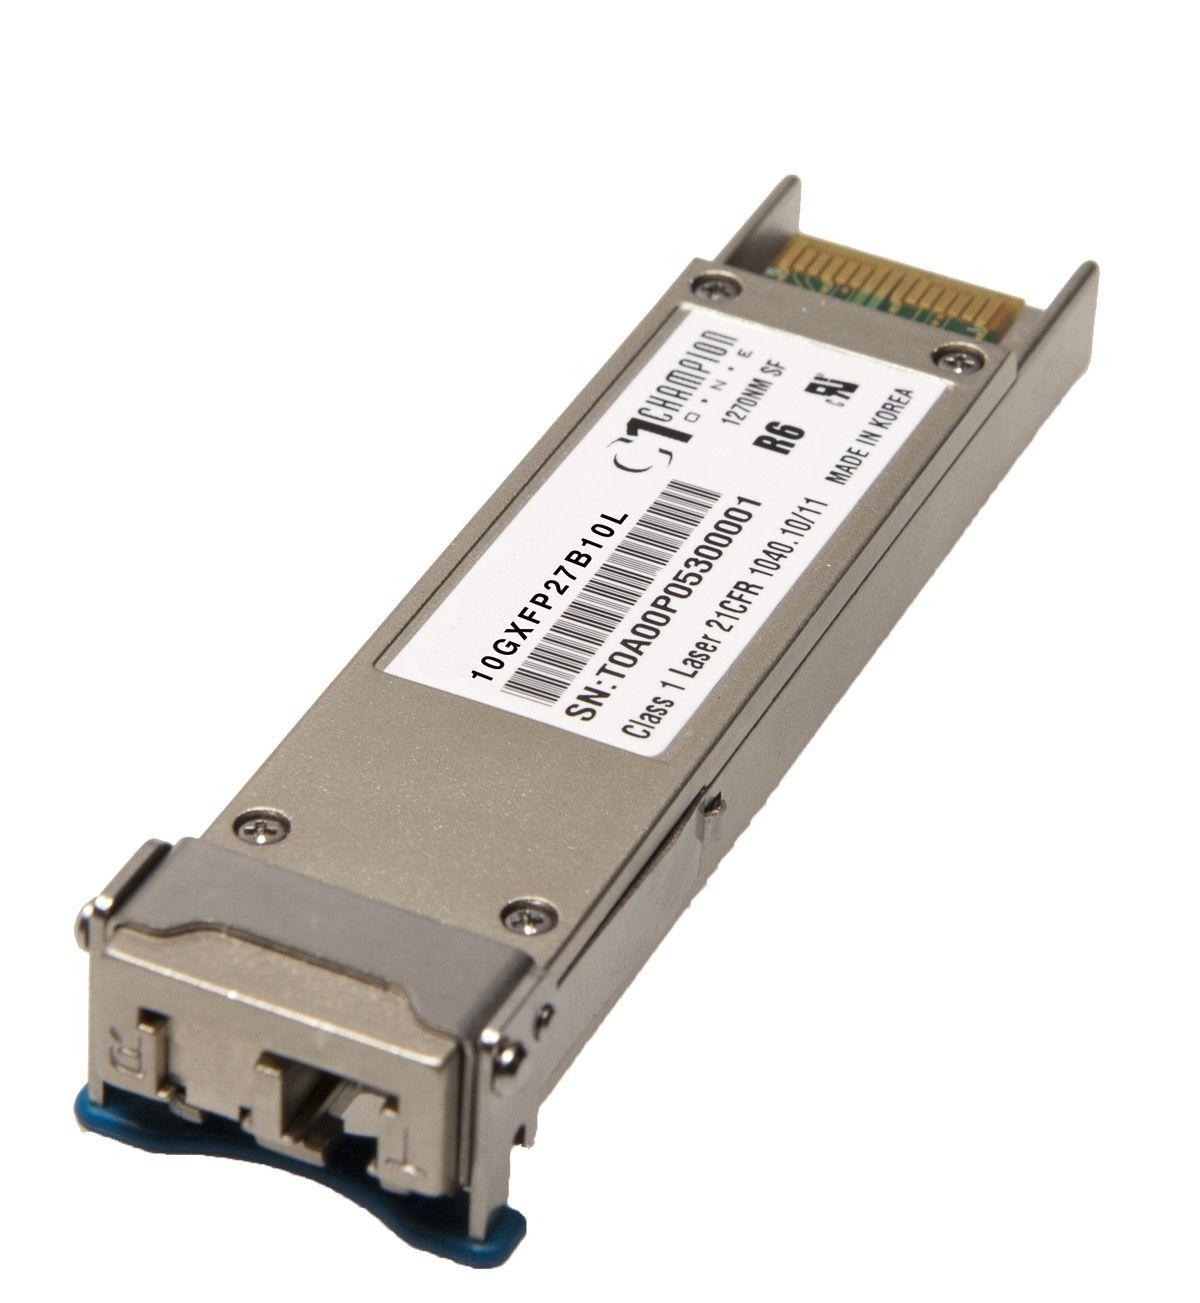 XFP Single Fiber 10km 10GXFP27B10L